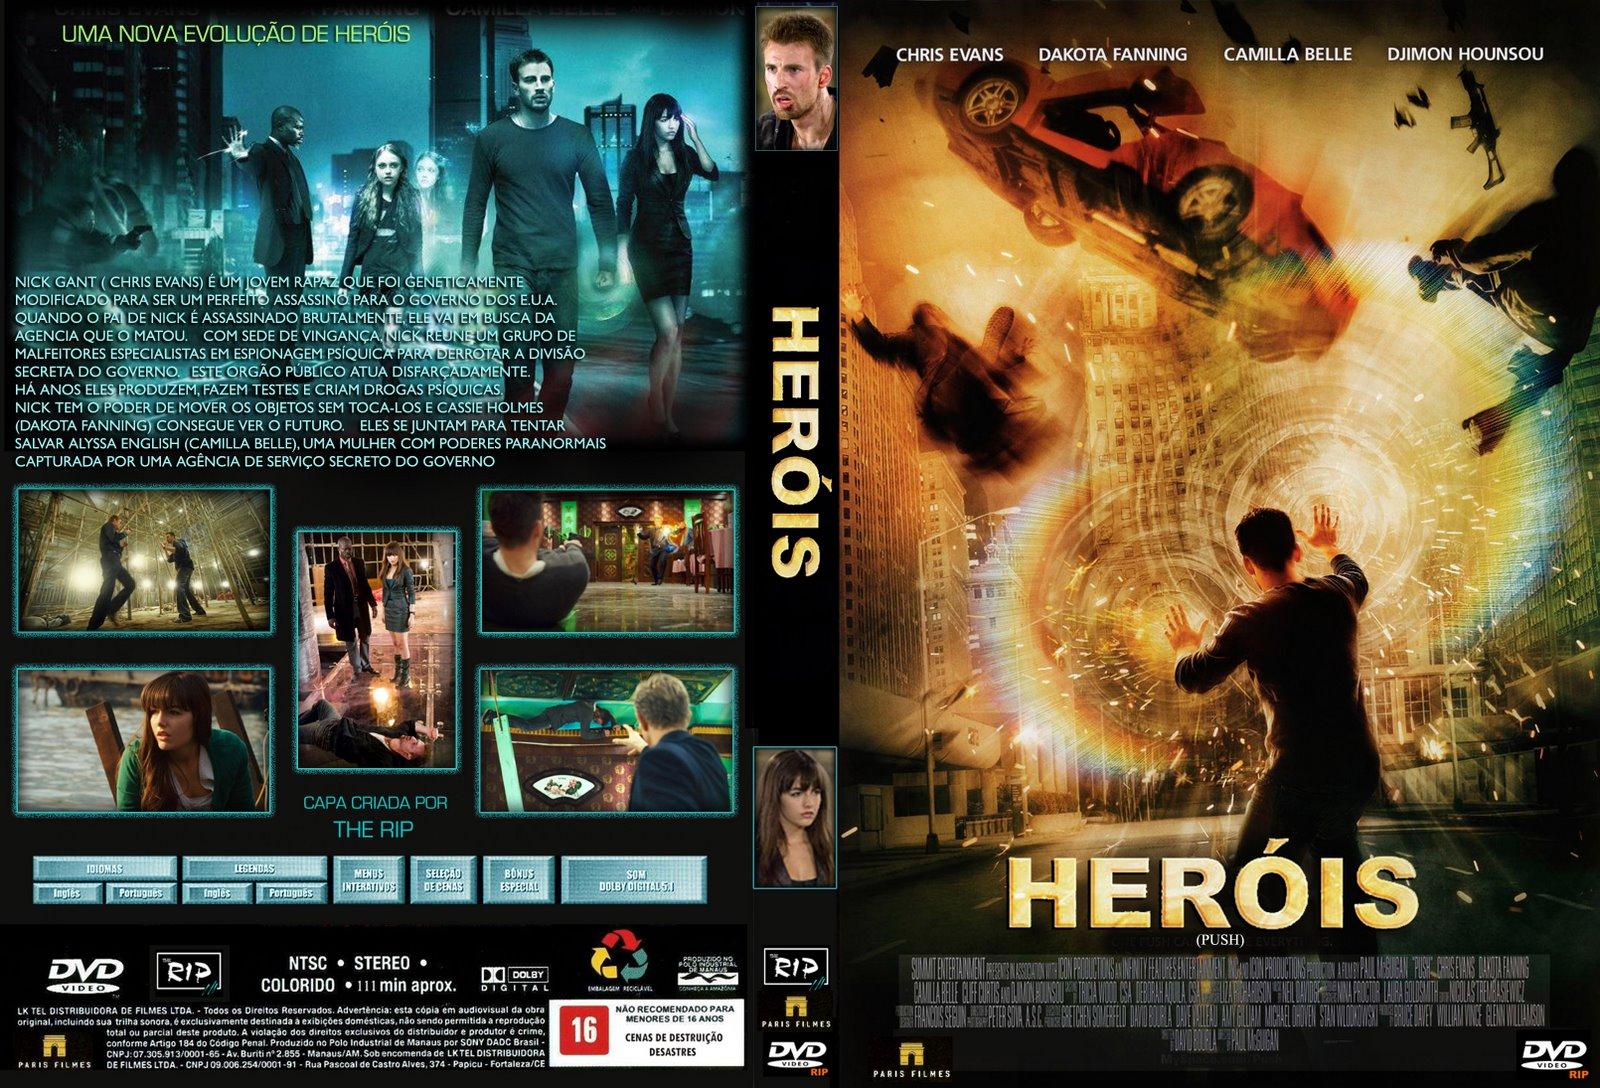 http://2.bp.blogspot.com/_6q6Cp3J4Jis/S_F8Ge-NrZI/AAAAAAAAAl8/tIS0ZSPzw8w/s1600/herois.JPG